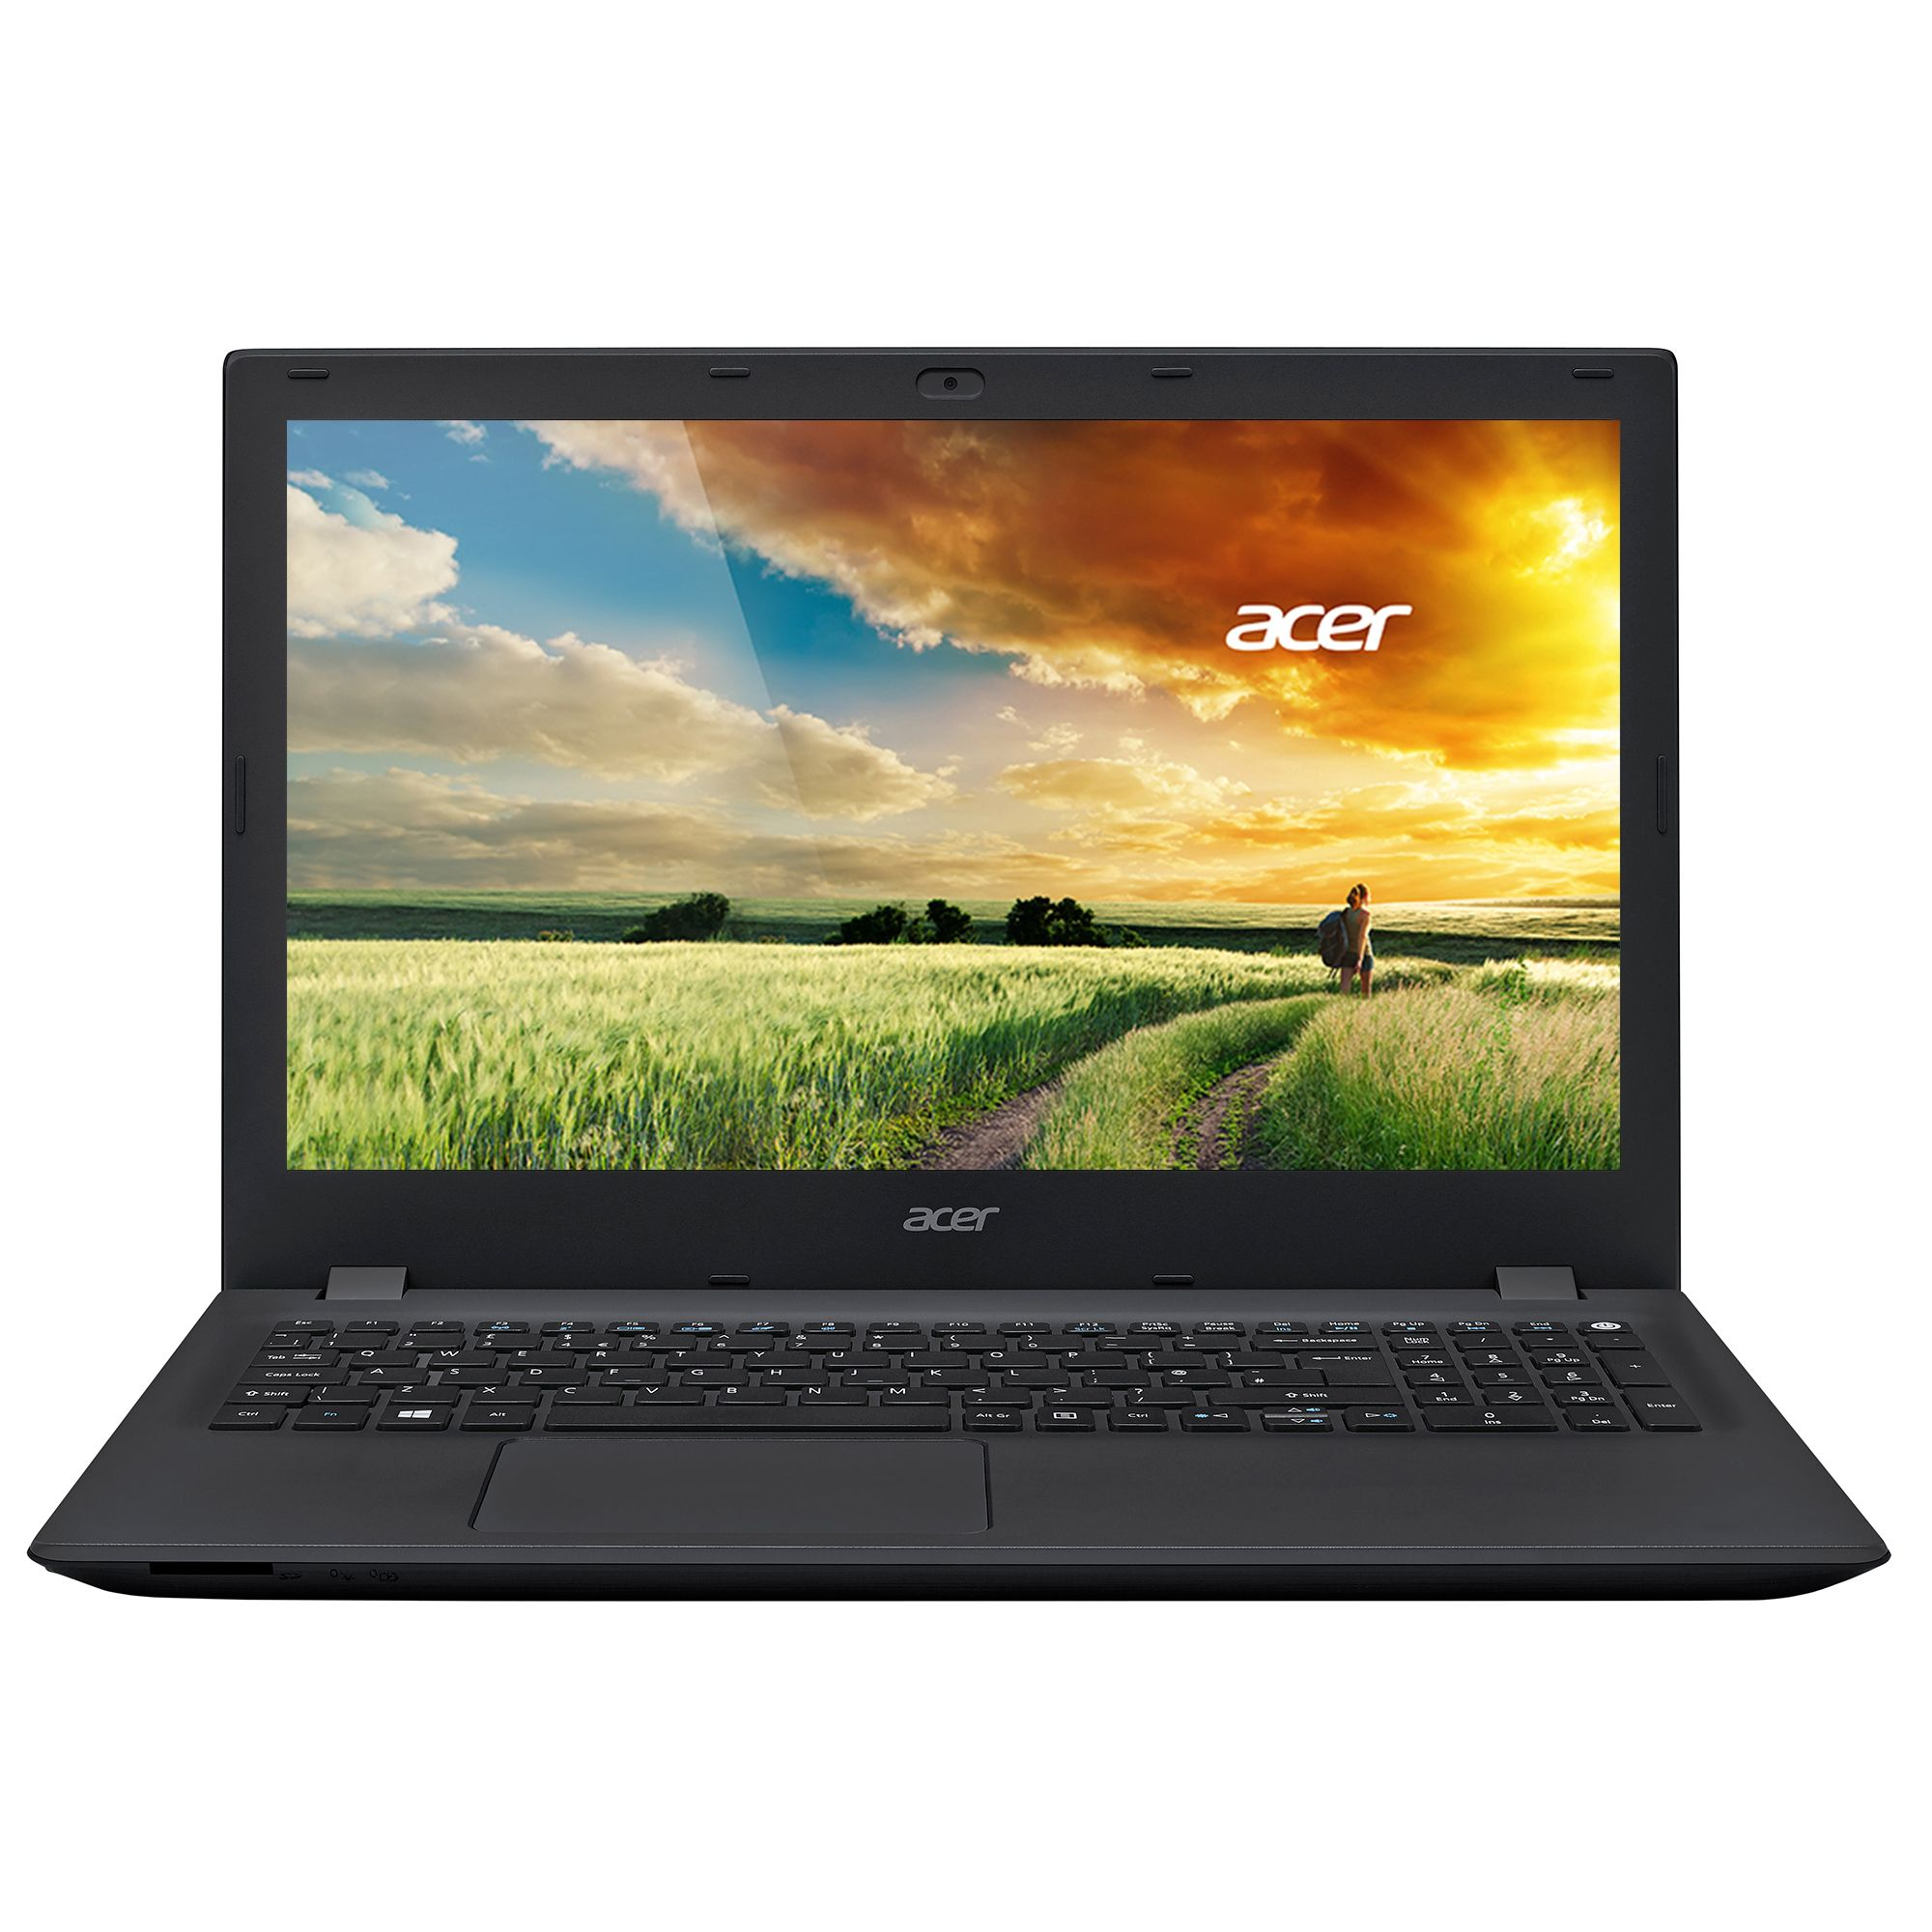 Notebook Acer Extensa 2540 15.6 HD Intel Core i3-6006U RAM 8GB HDD 1TB Windows 10 Pro